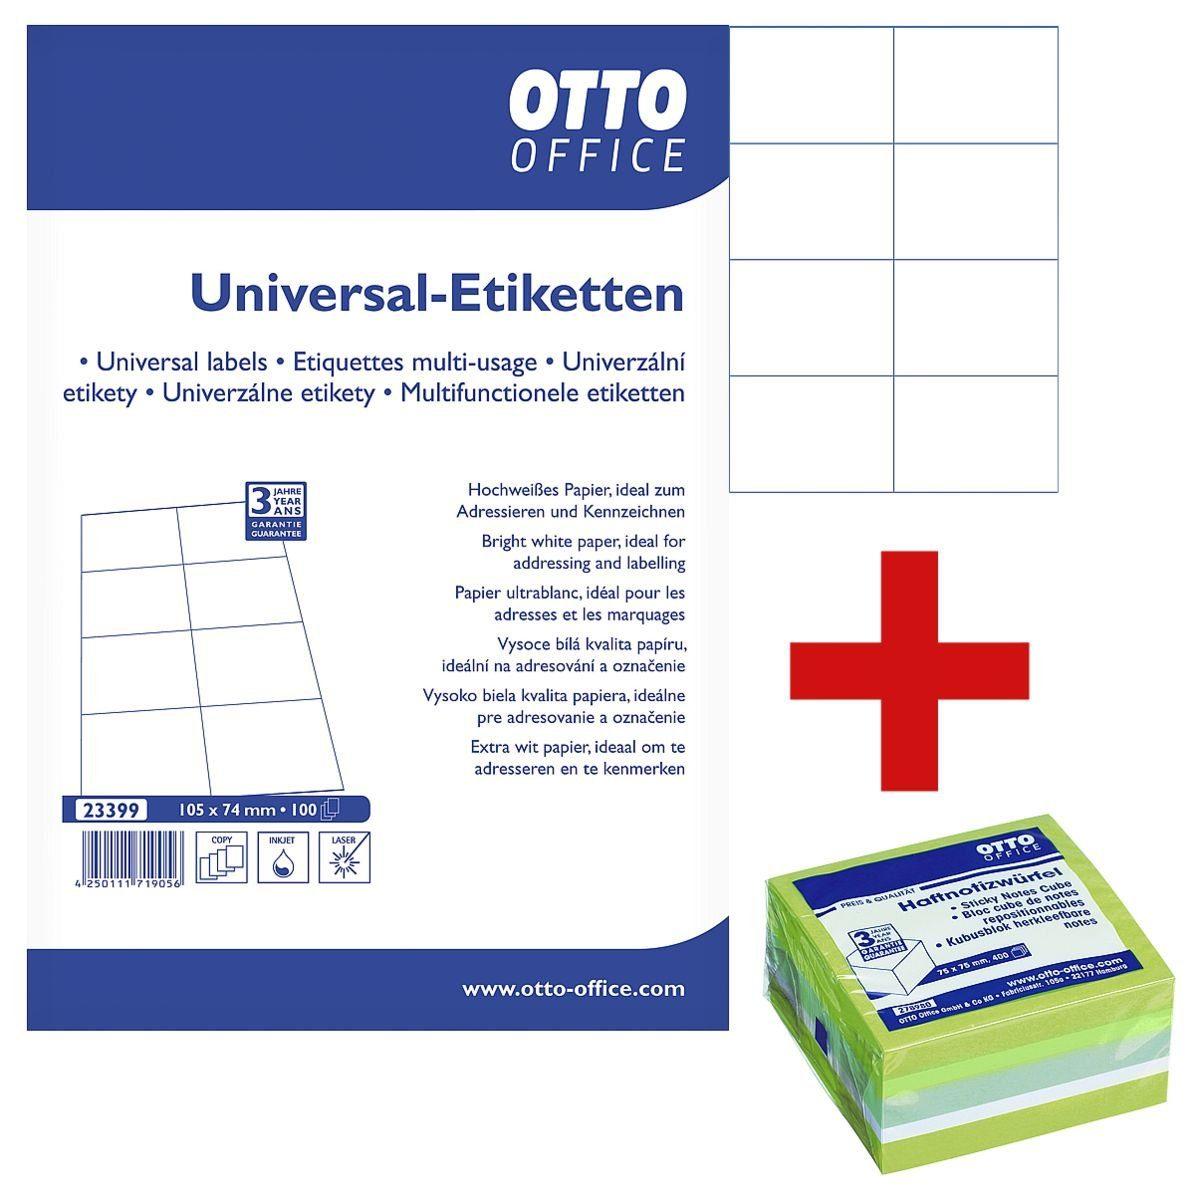 OTTO Office Standard 800er-Pack Universal Klebeetiketten inkl. Haftnotizwürfel 1 Set